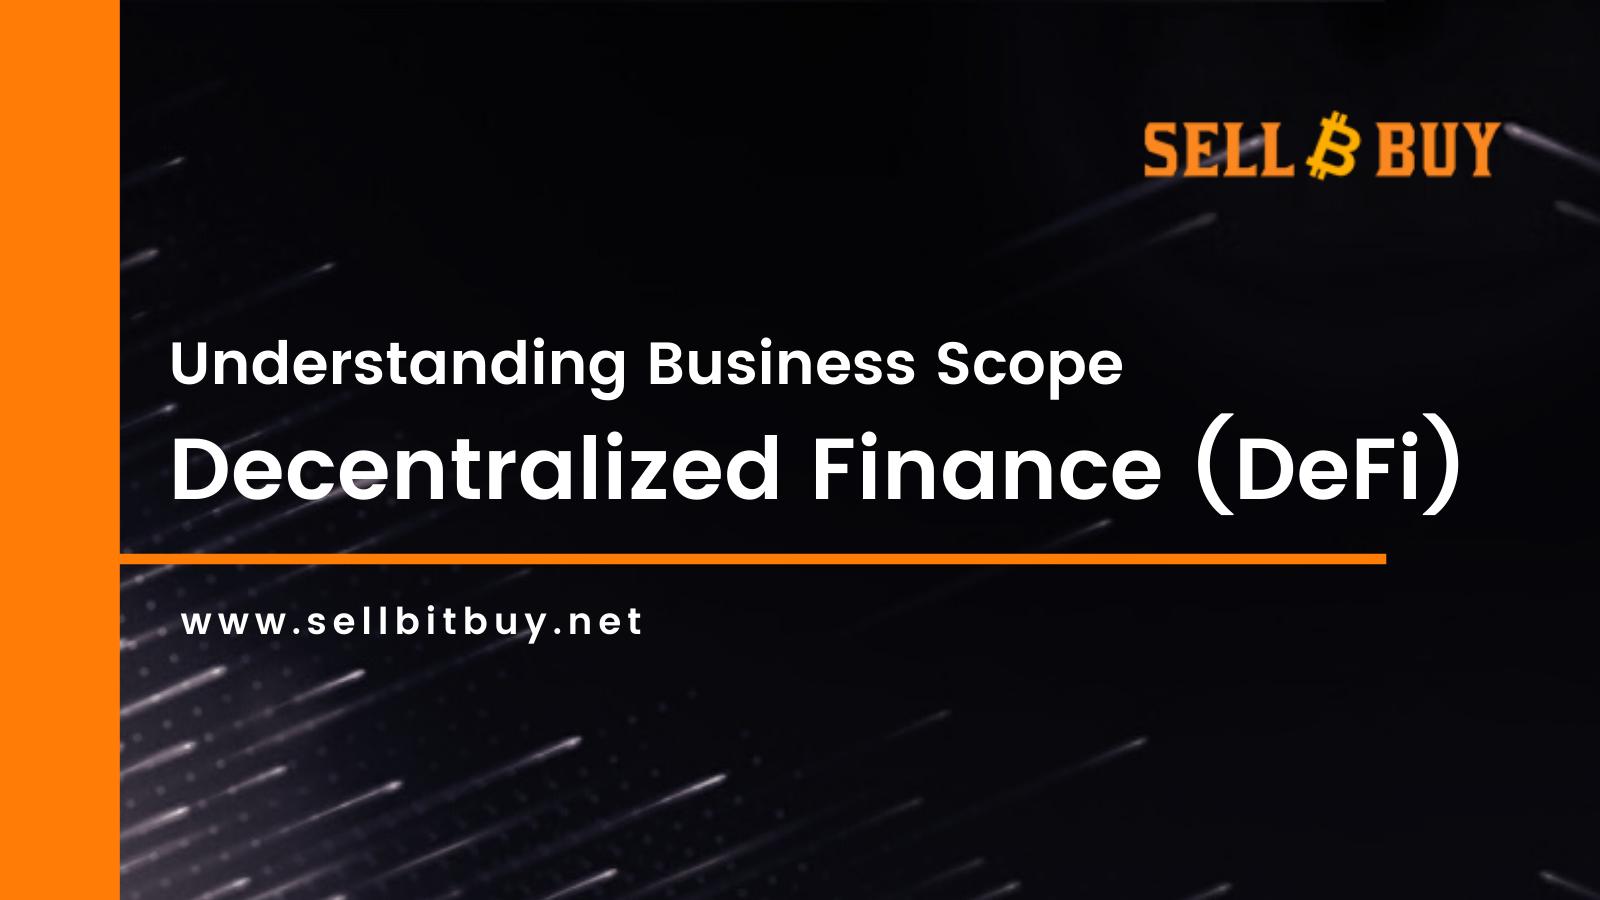 Understanding the Business Scope of DeFi